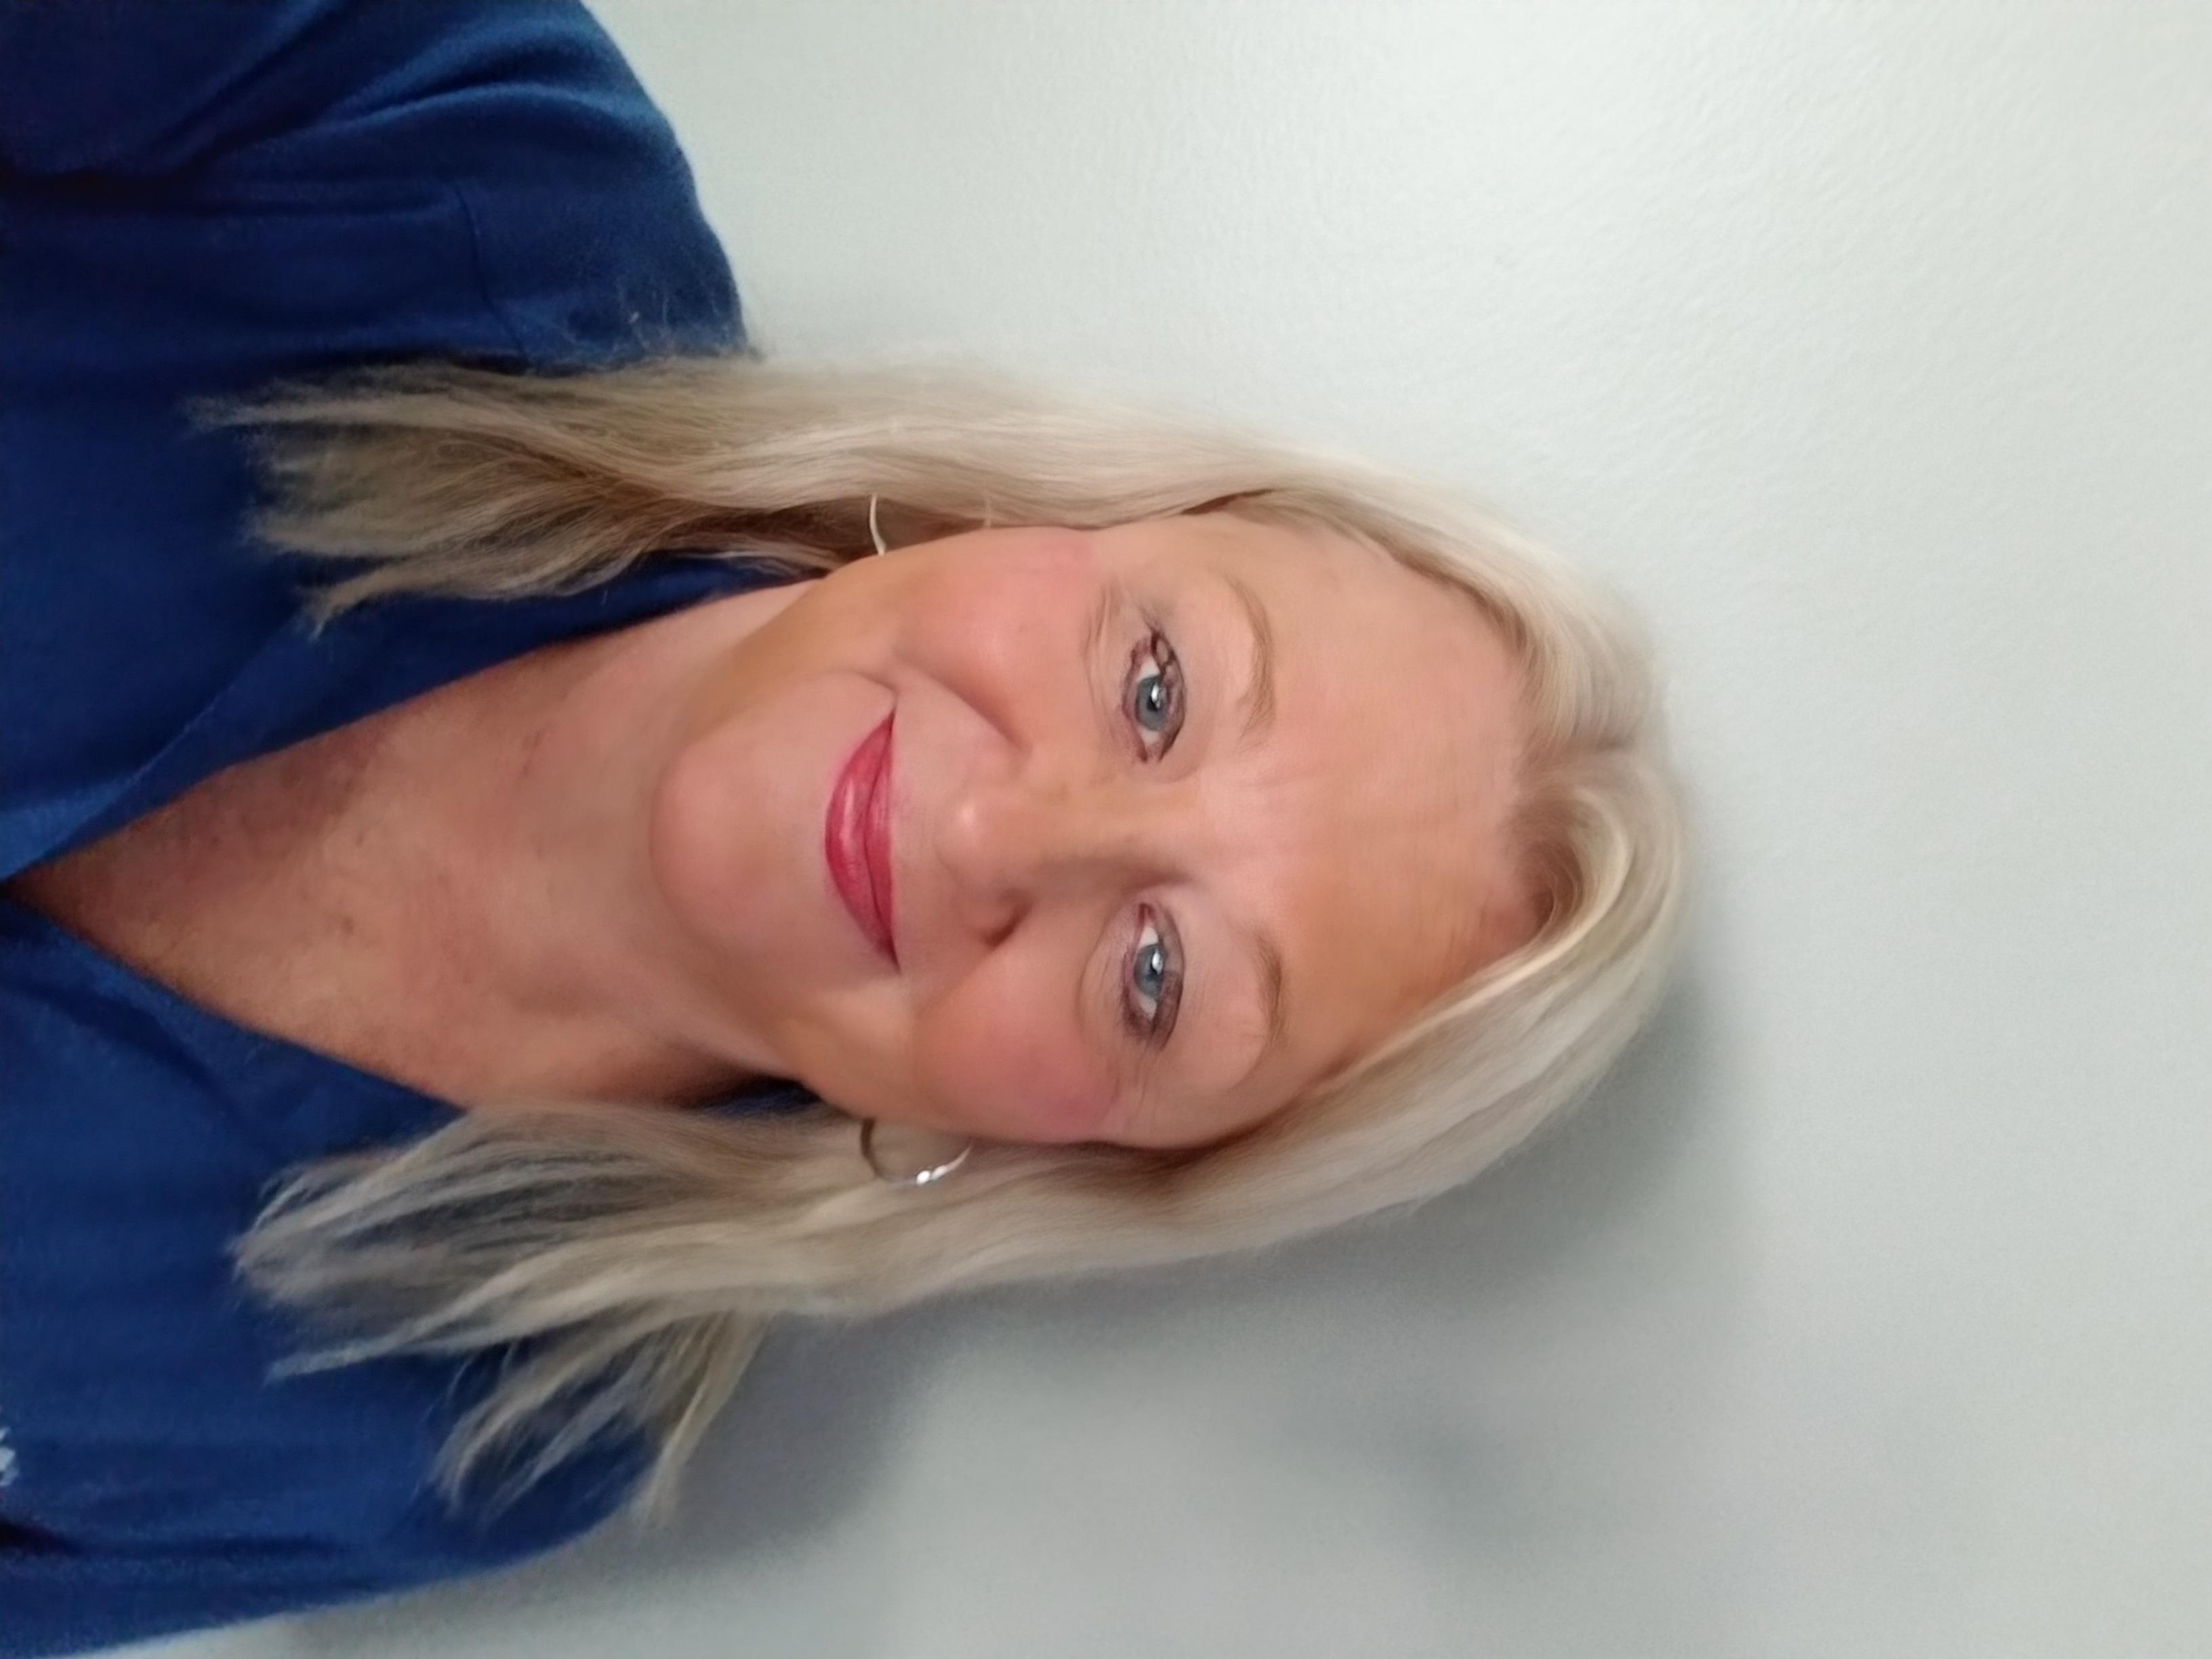 Sue undefined Wells